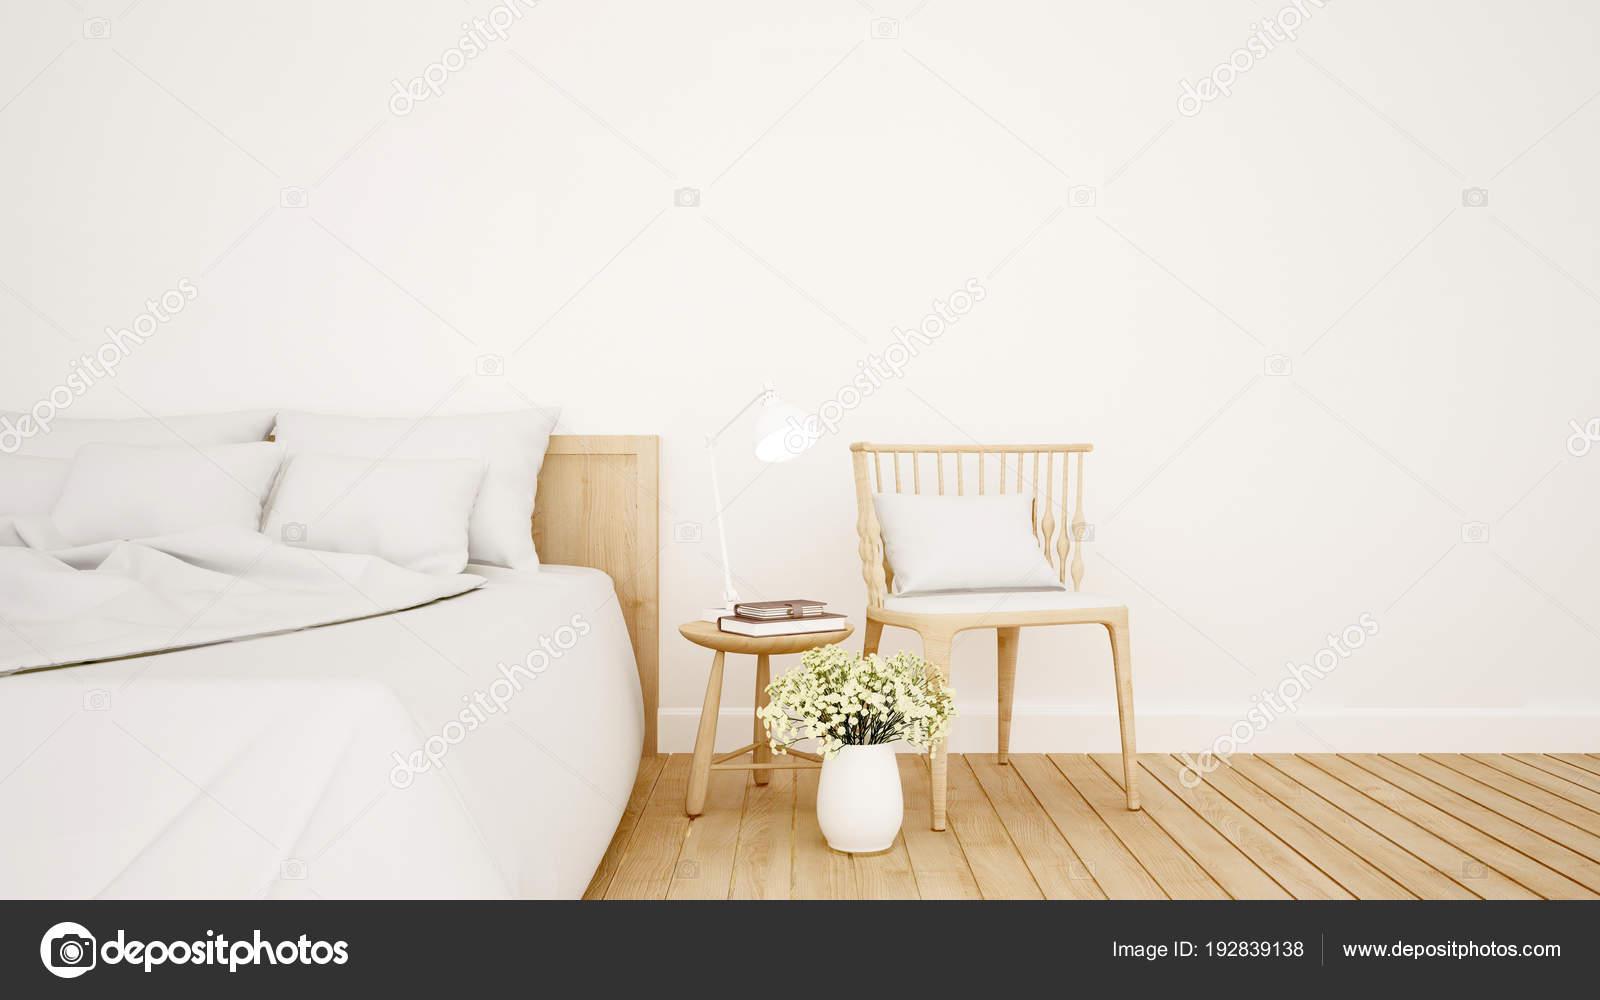 slaapkamer en woonkamer in hotel of appartement - interieur design ...